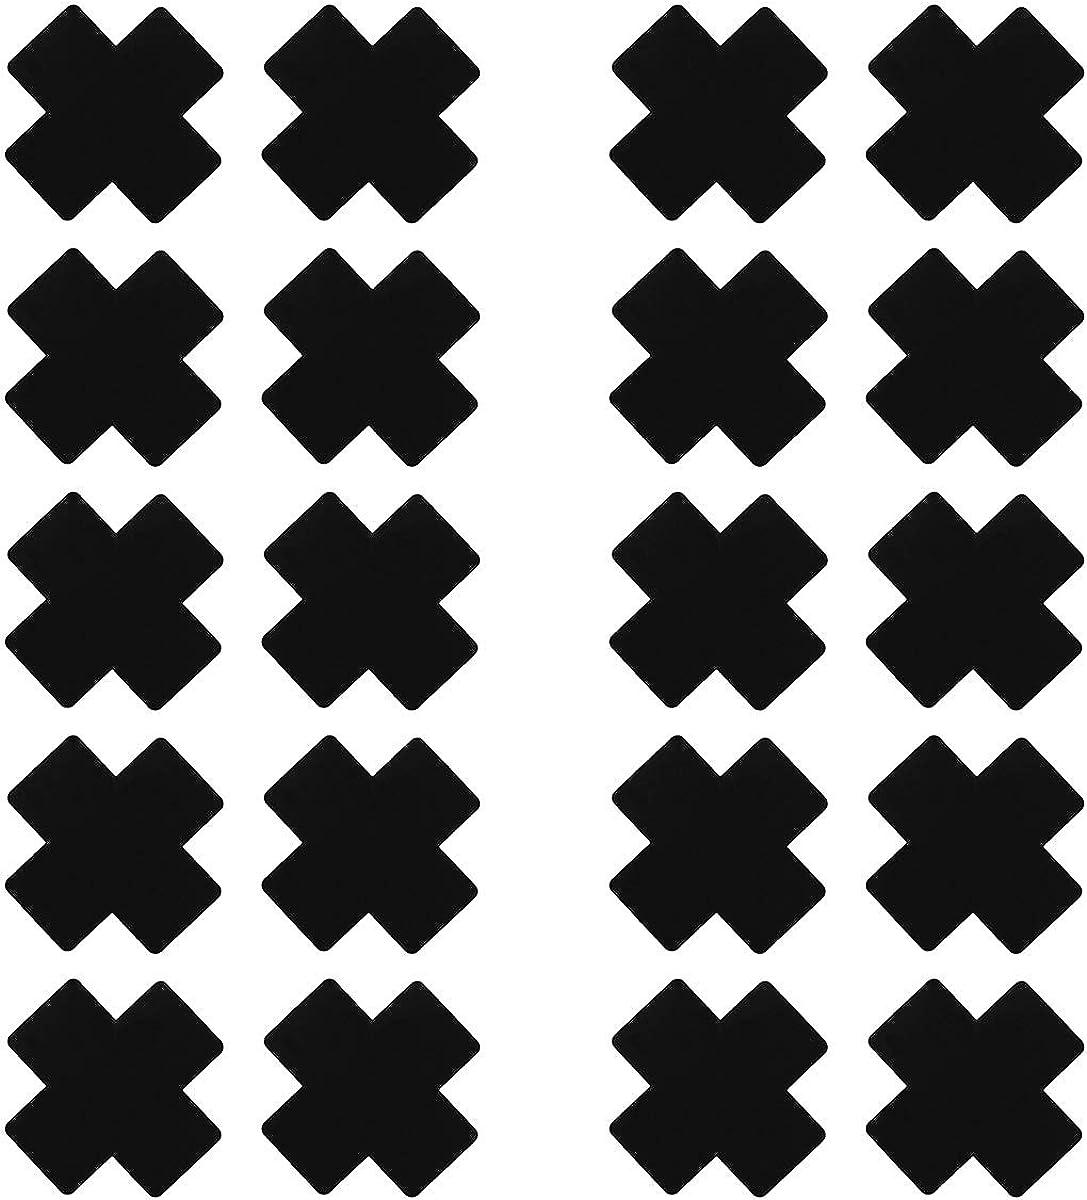 US 20Pcs Cross Shape Self-Adhesive Satin Nipple Covers Breast Pasties Stickers